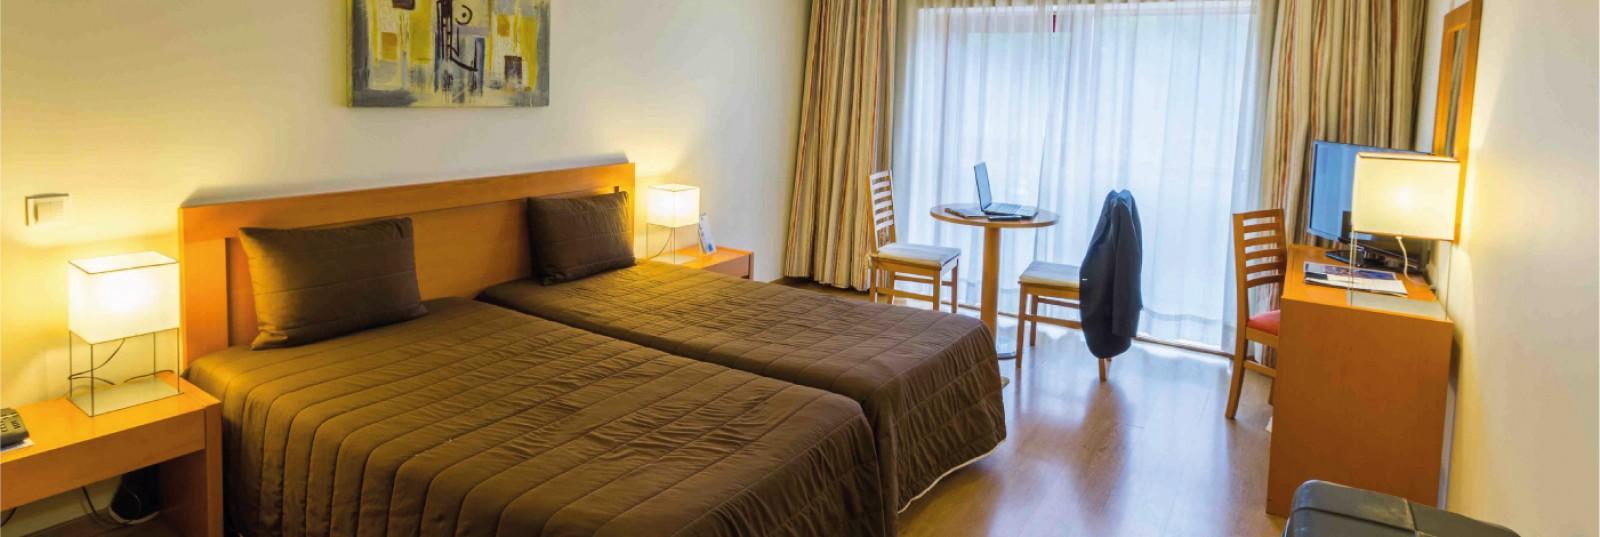 Eurosol Residence Hotel Apartamento- T0 Twin